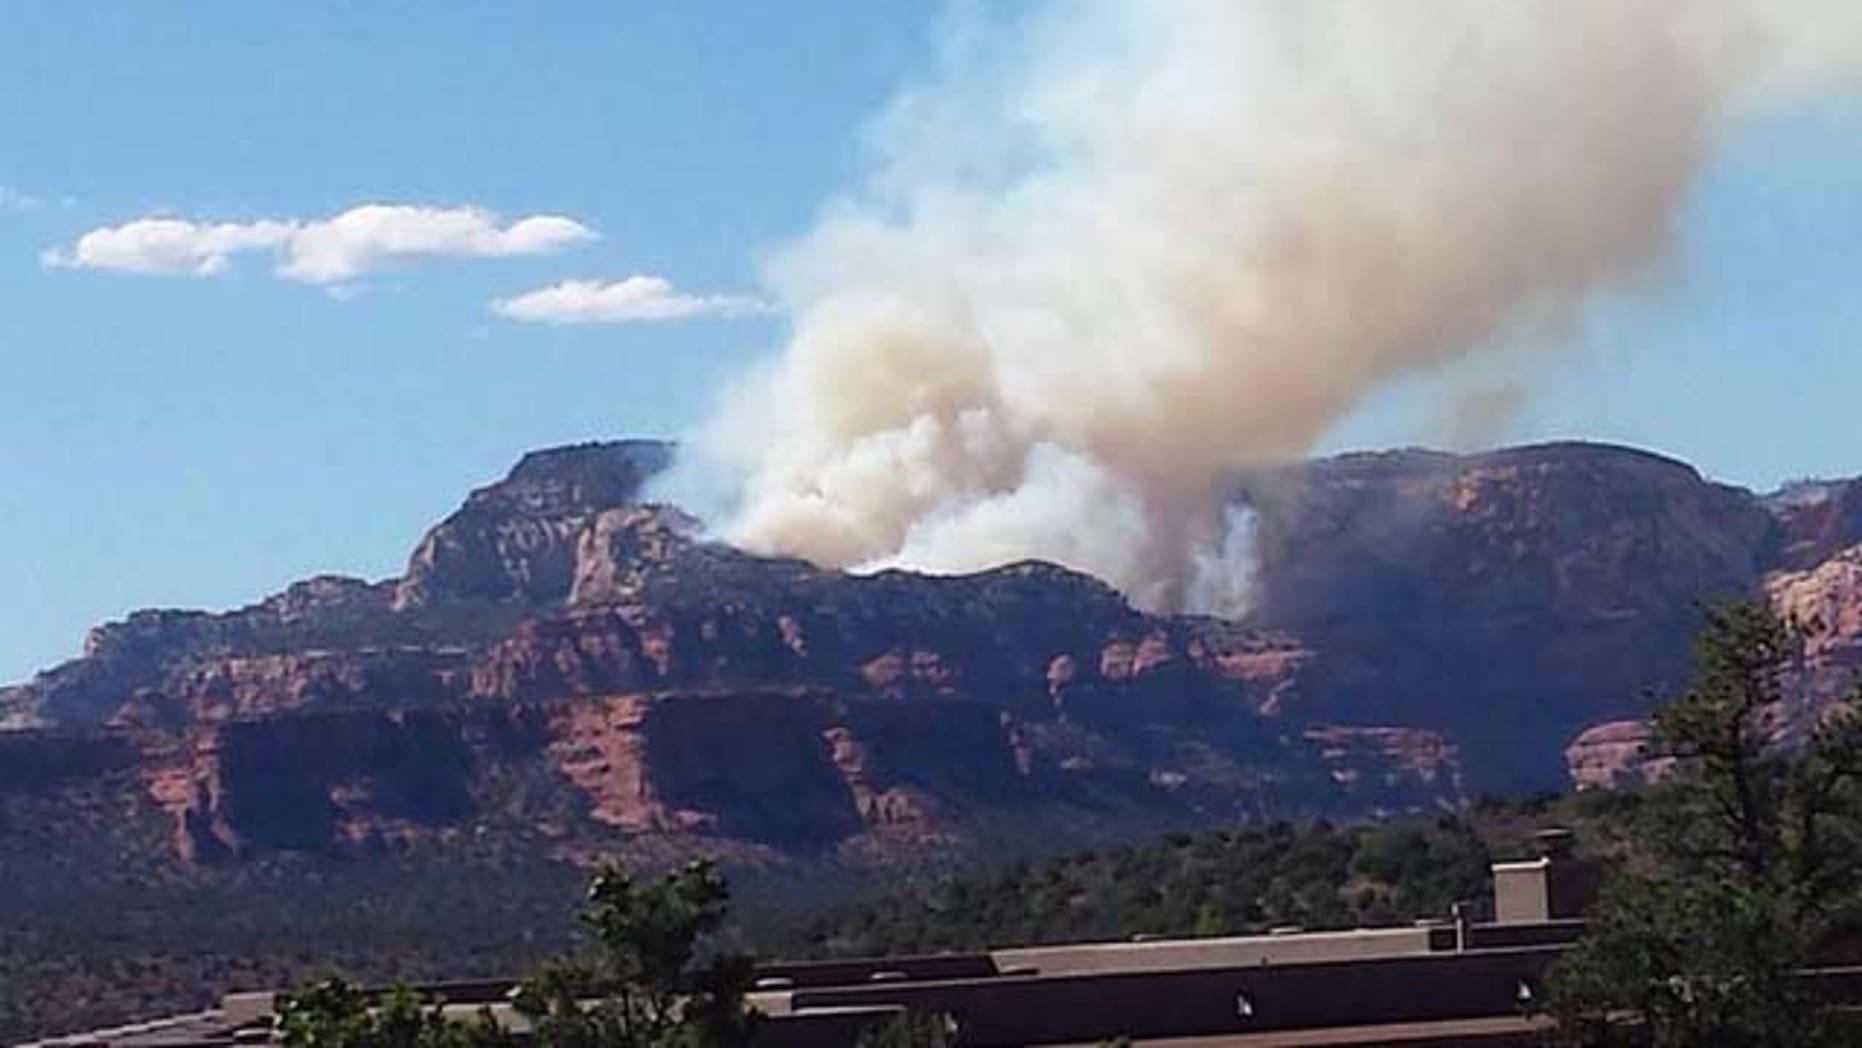 July 20, 2014: Smoke from a fire sparked by the crash of a single-engine plane rises over Fay Canyon, near Sedona, Arizona. (MyFoxPhoenix.com)